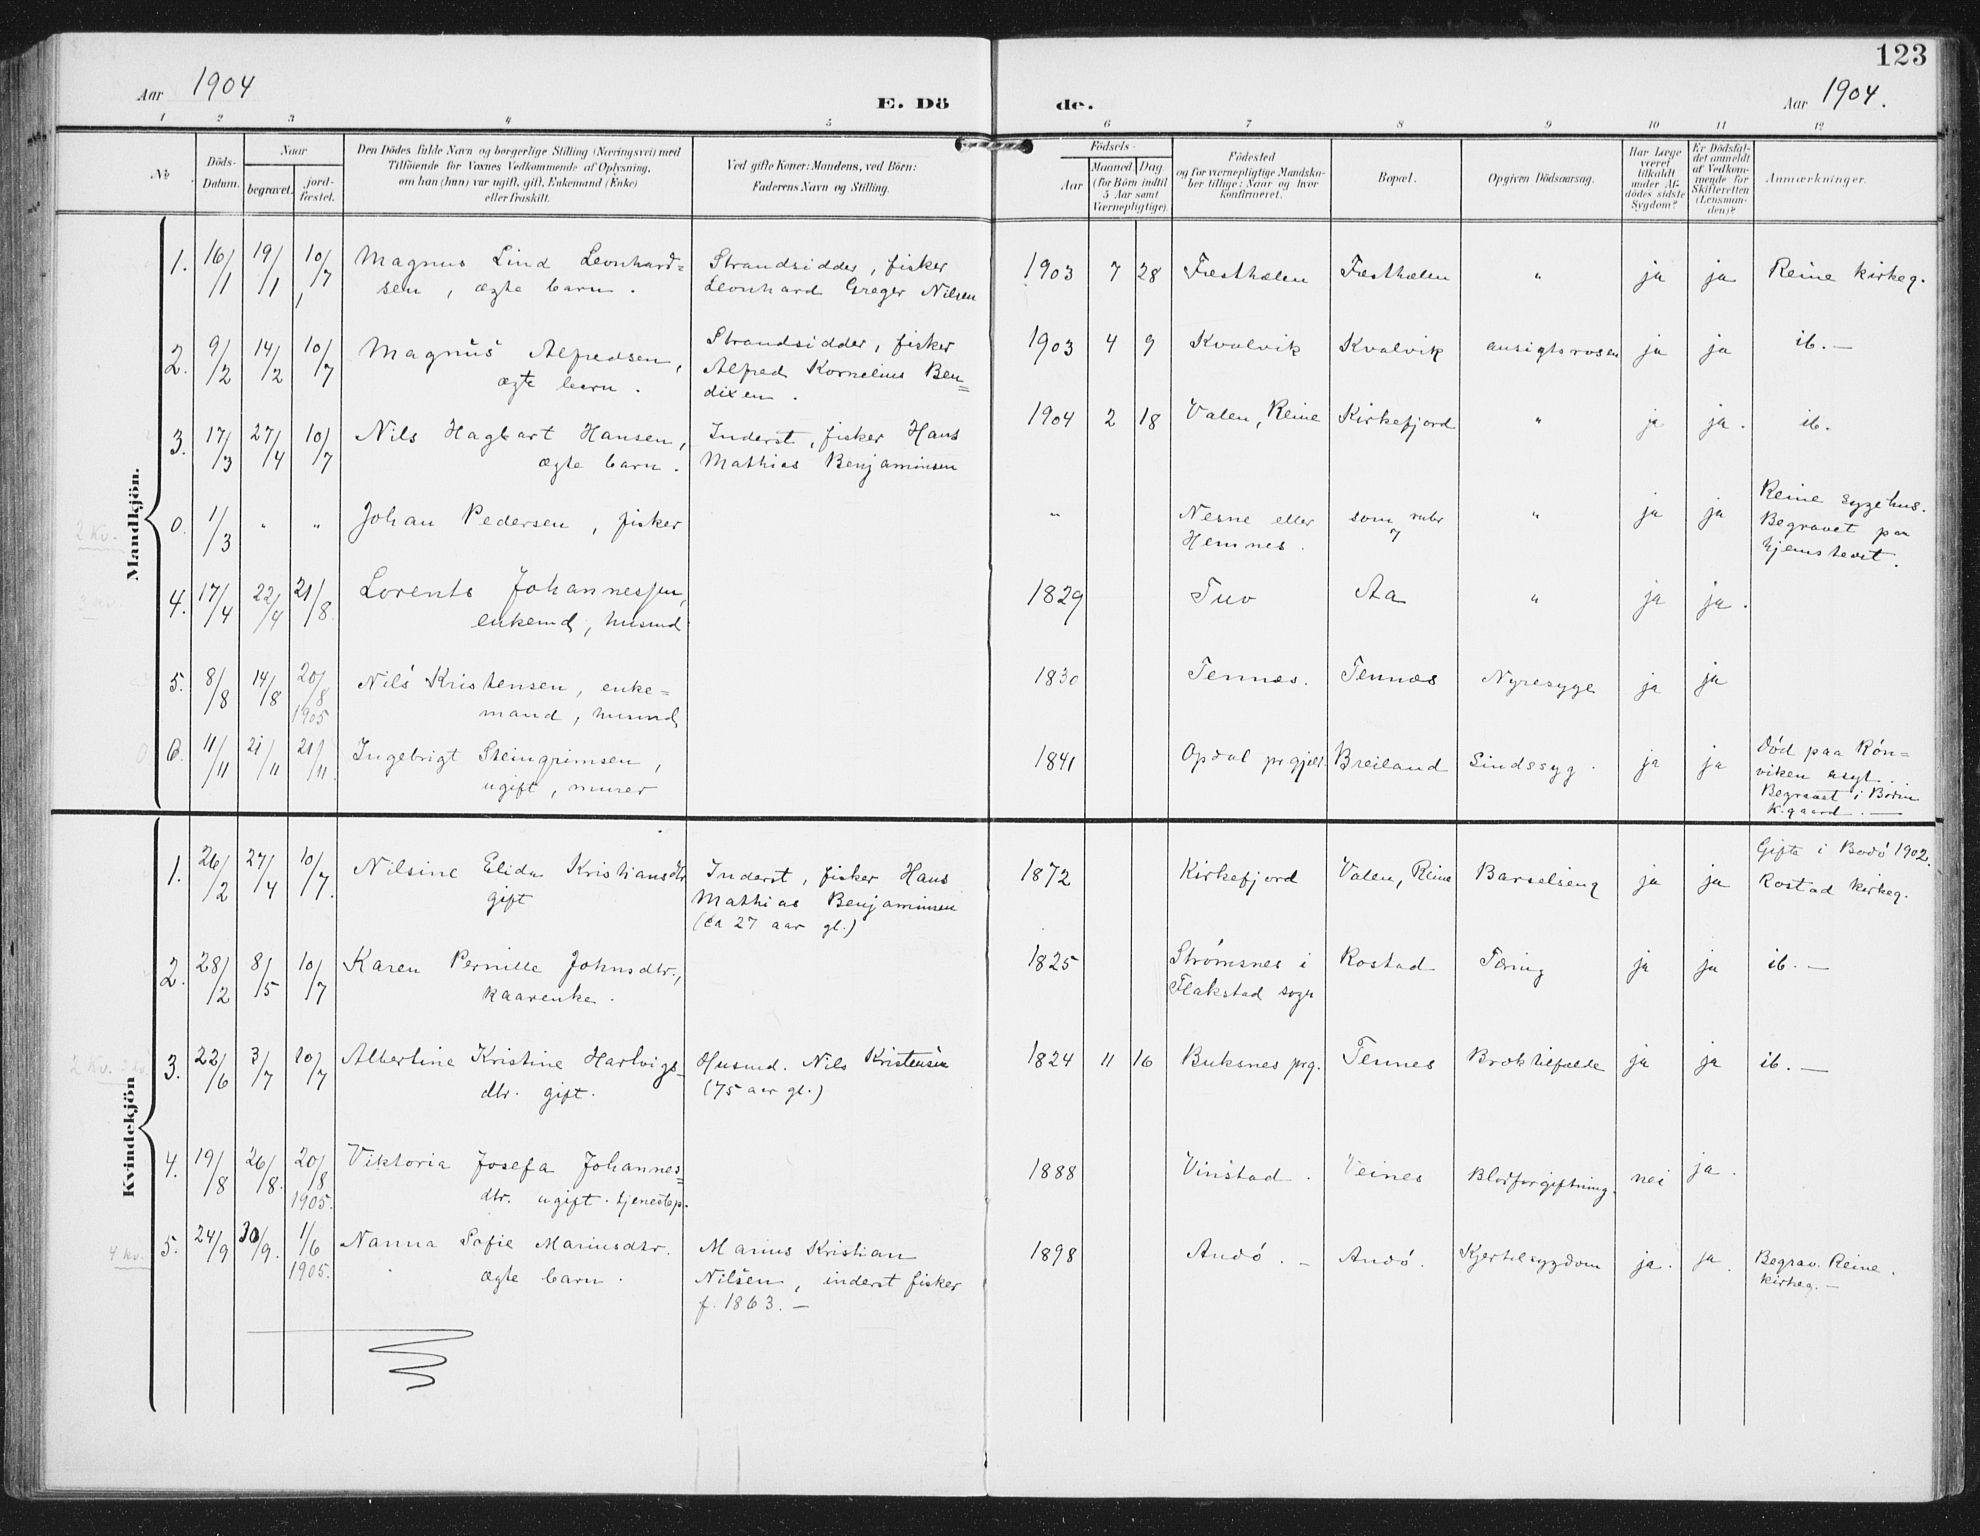 SAT, Ministerialprotokoller, klokkerbøker og fødselsregistre - Nordland, 886/L1221: Ministerialbok nr. 886A03, 1903-1913, s. 123